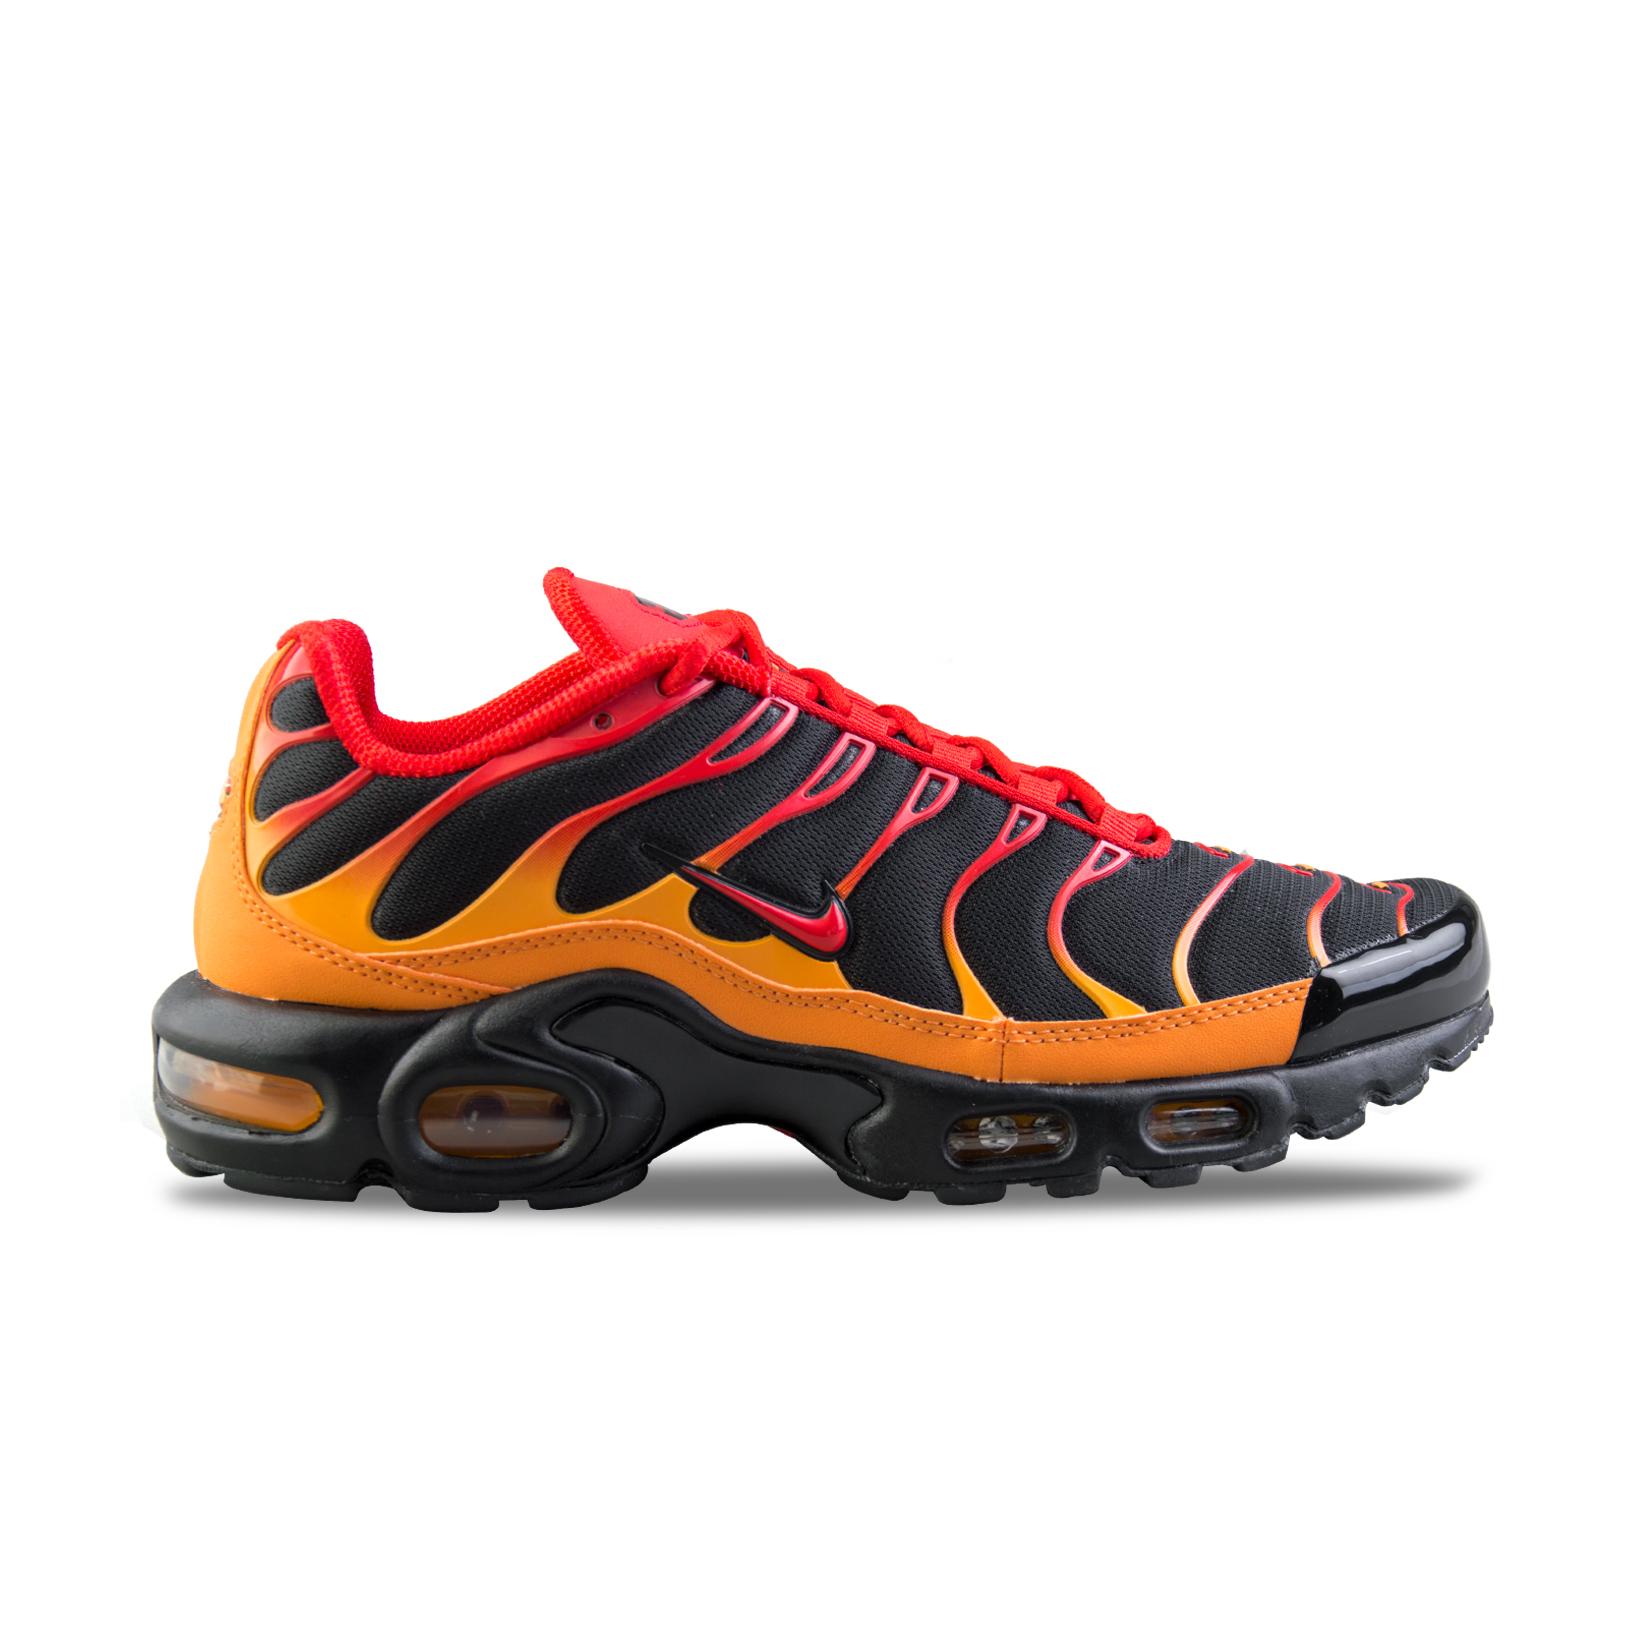 Nike Air Max Plus Orange - Black